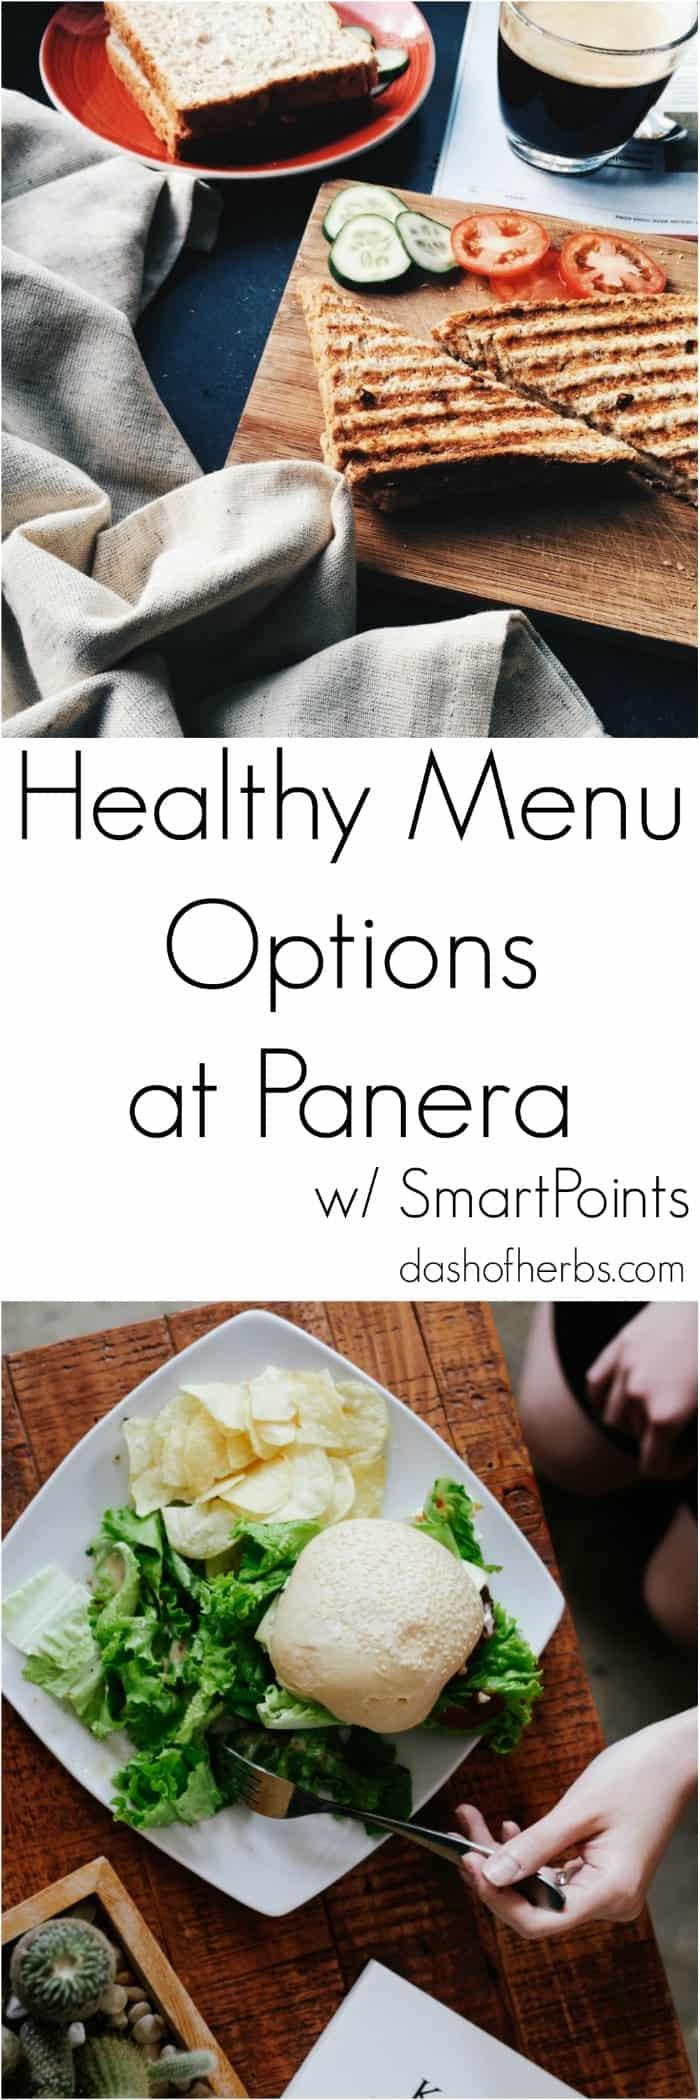 Panera Bread Healthy Menu  Healthy Menu Options at Panera Bread Dash of Herbs